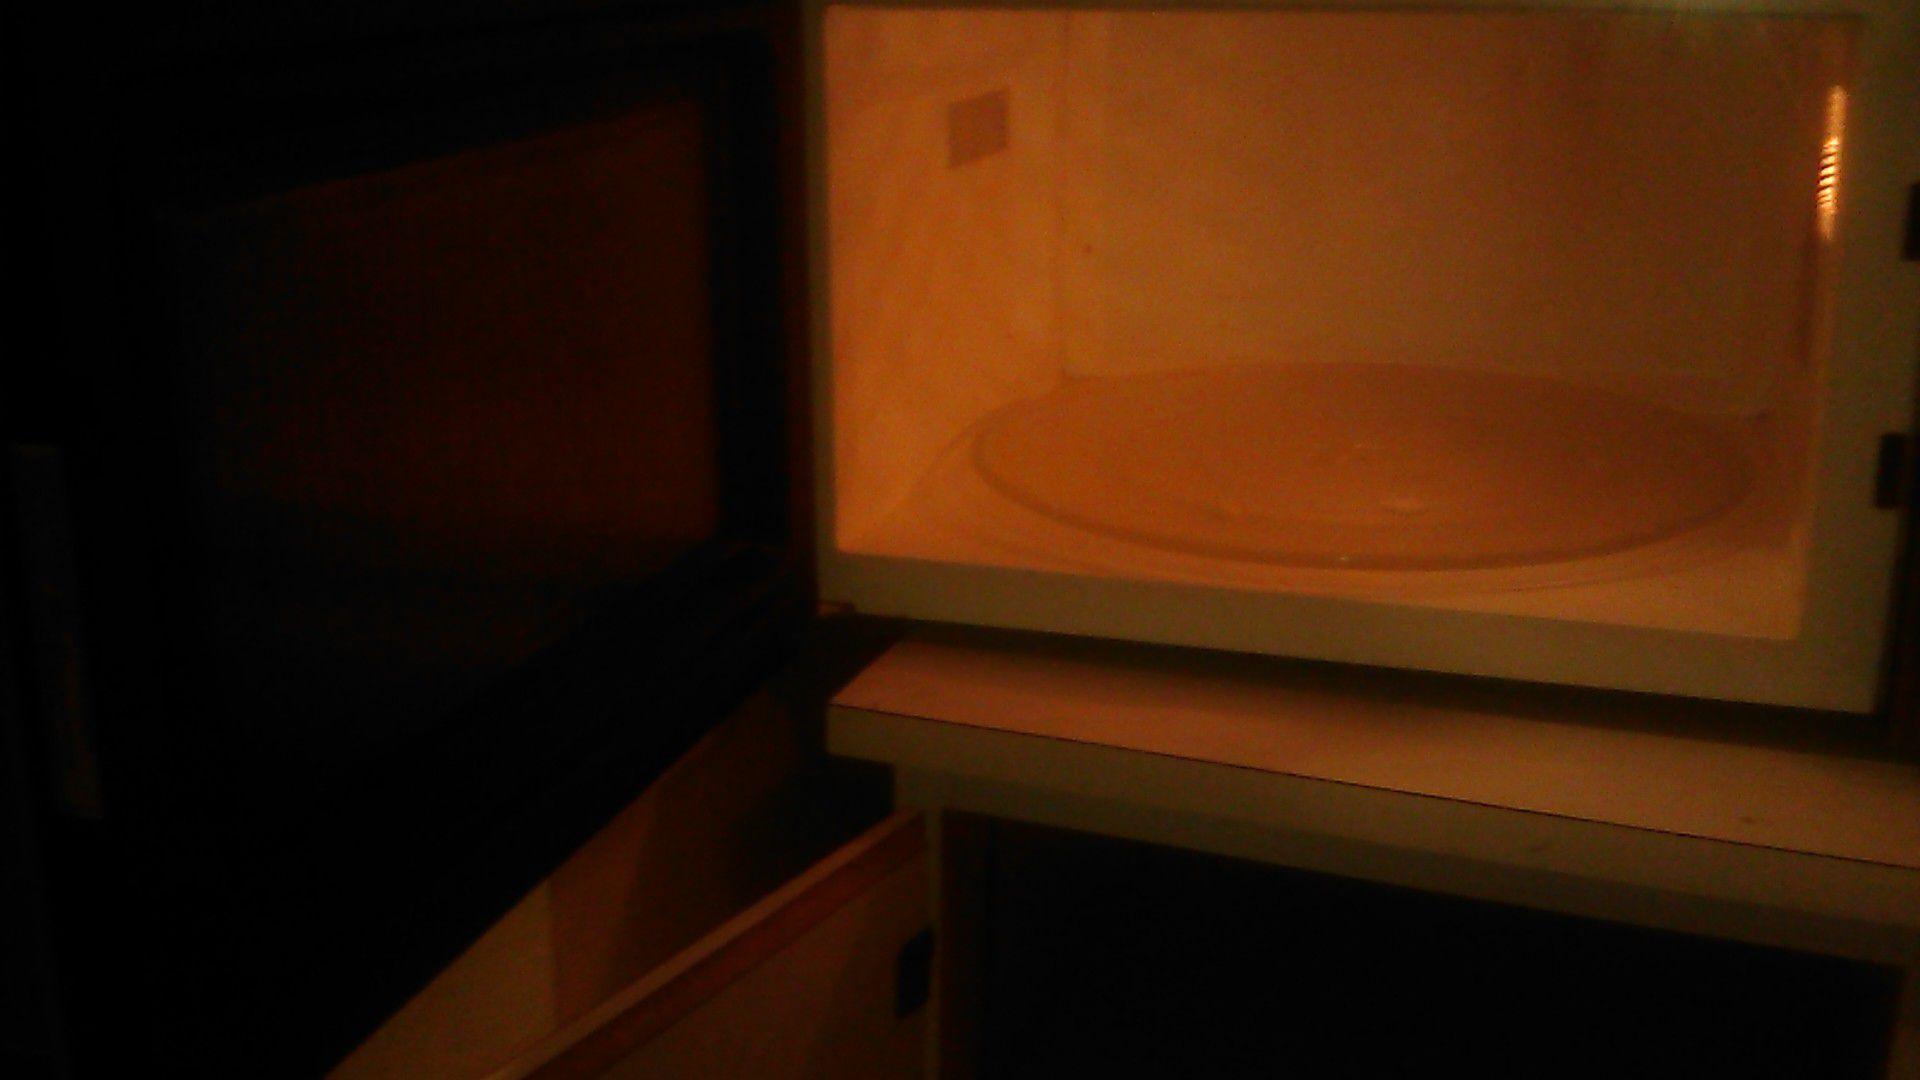 Panasonic Microwave Stainless Steal